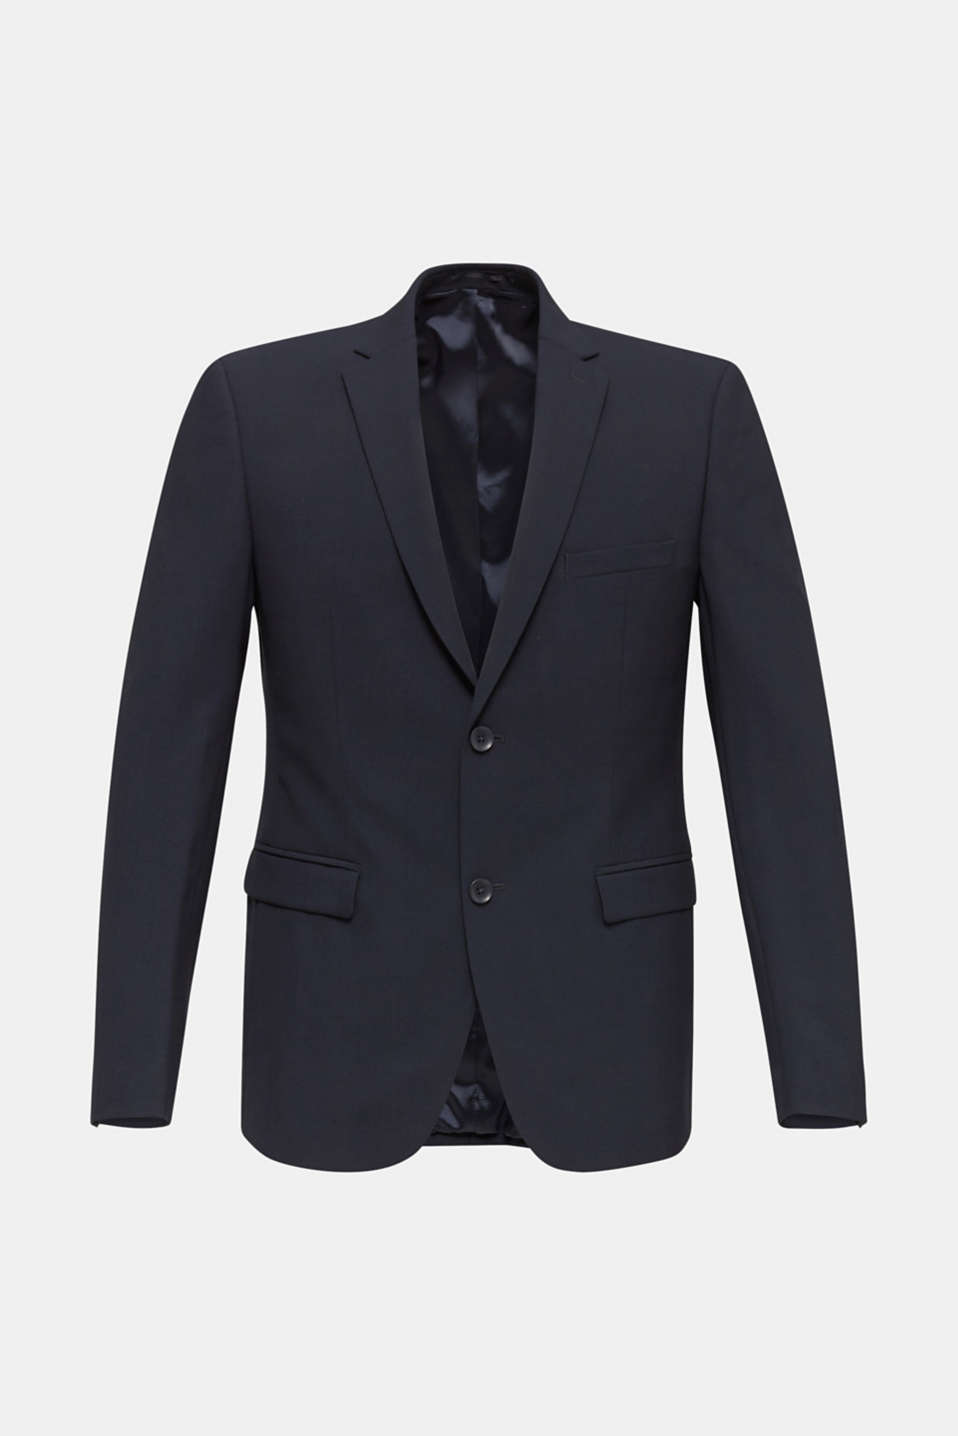 ACTIVE SUIT tailored jacket, wool blend, DARK BLUE, detail image number 7